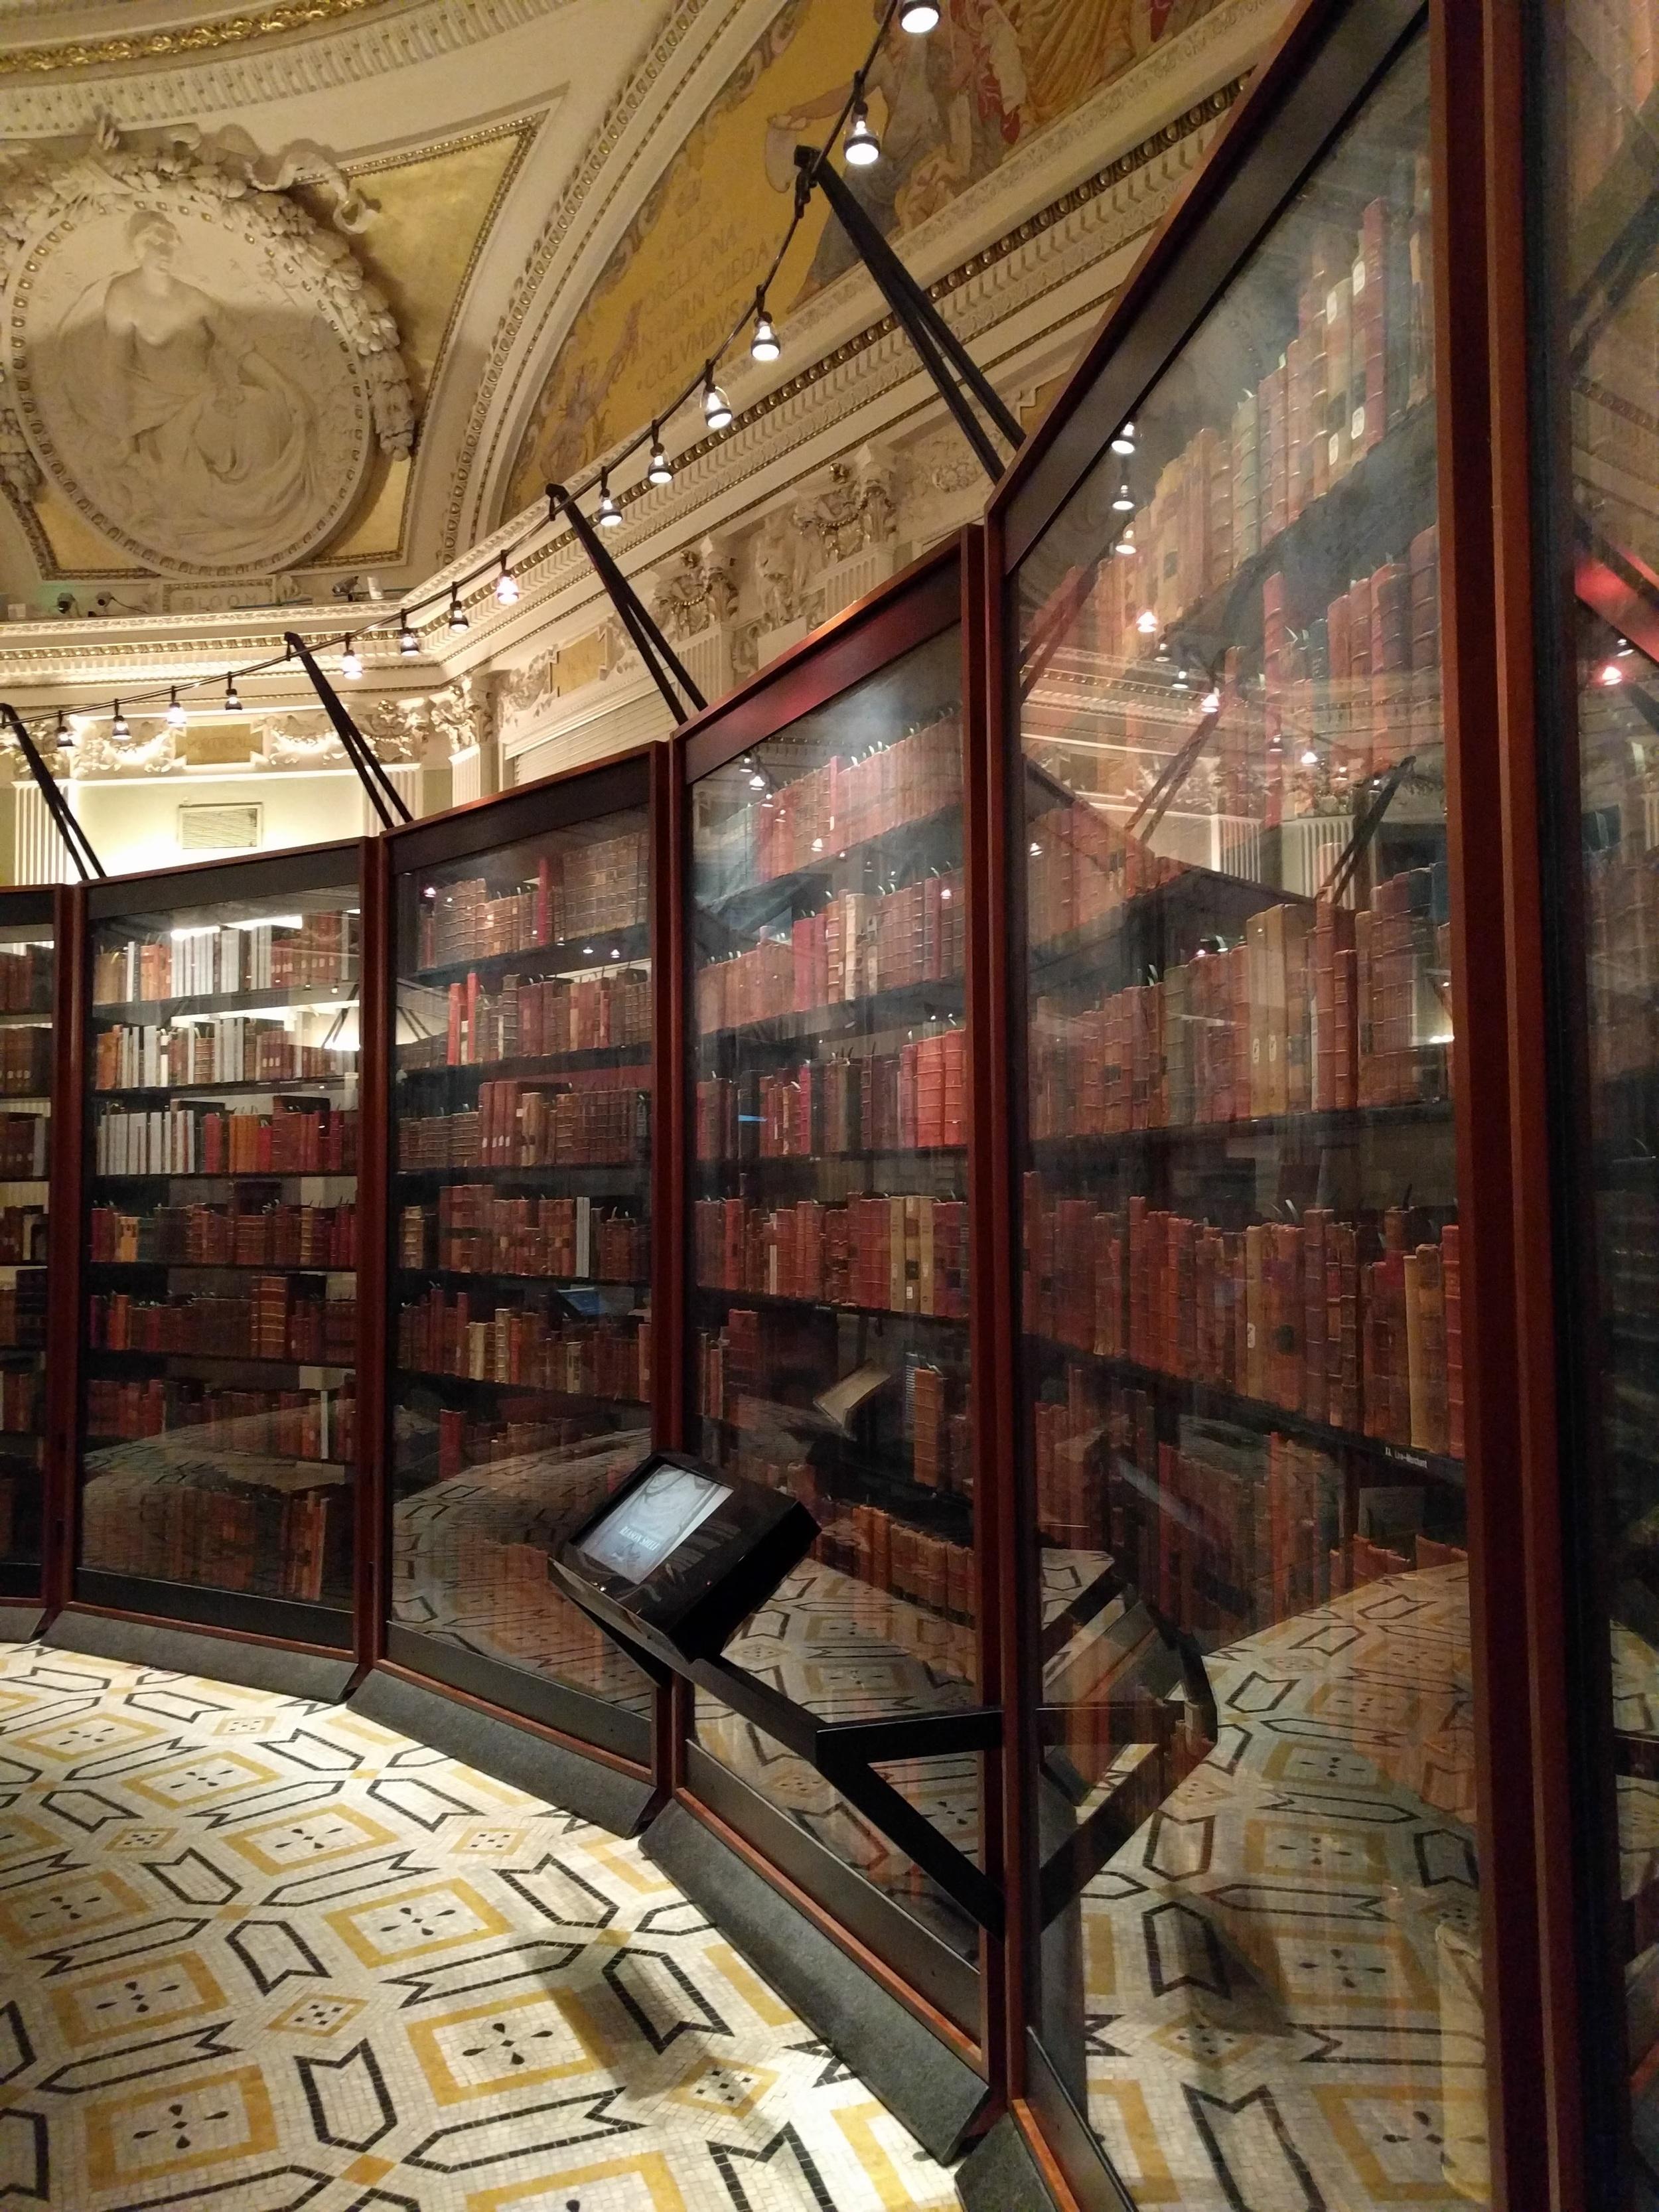 Thomas Jefferson's collection